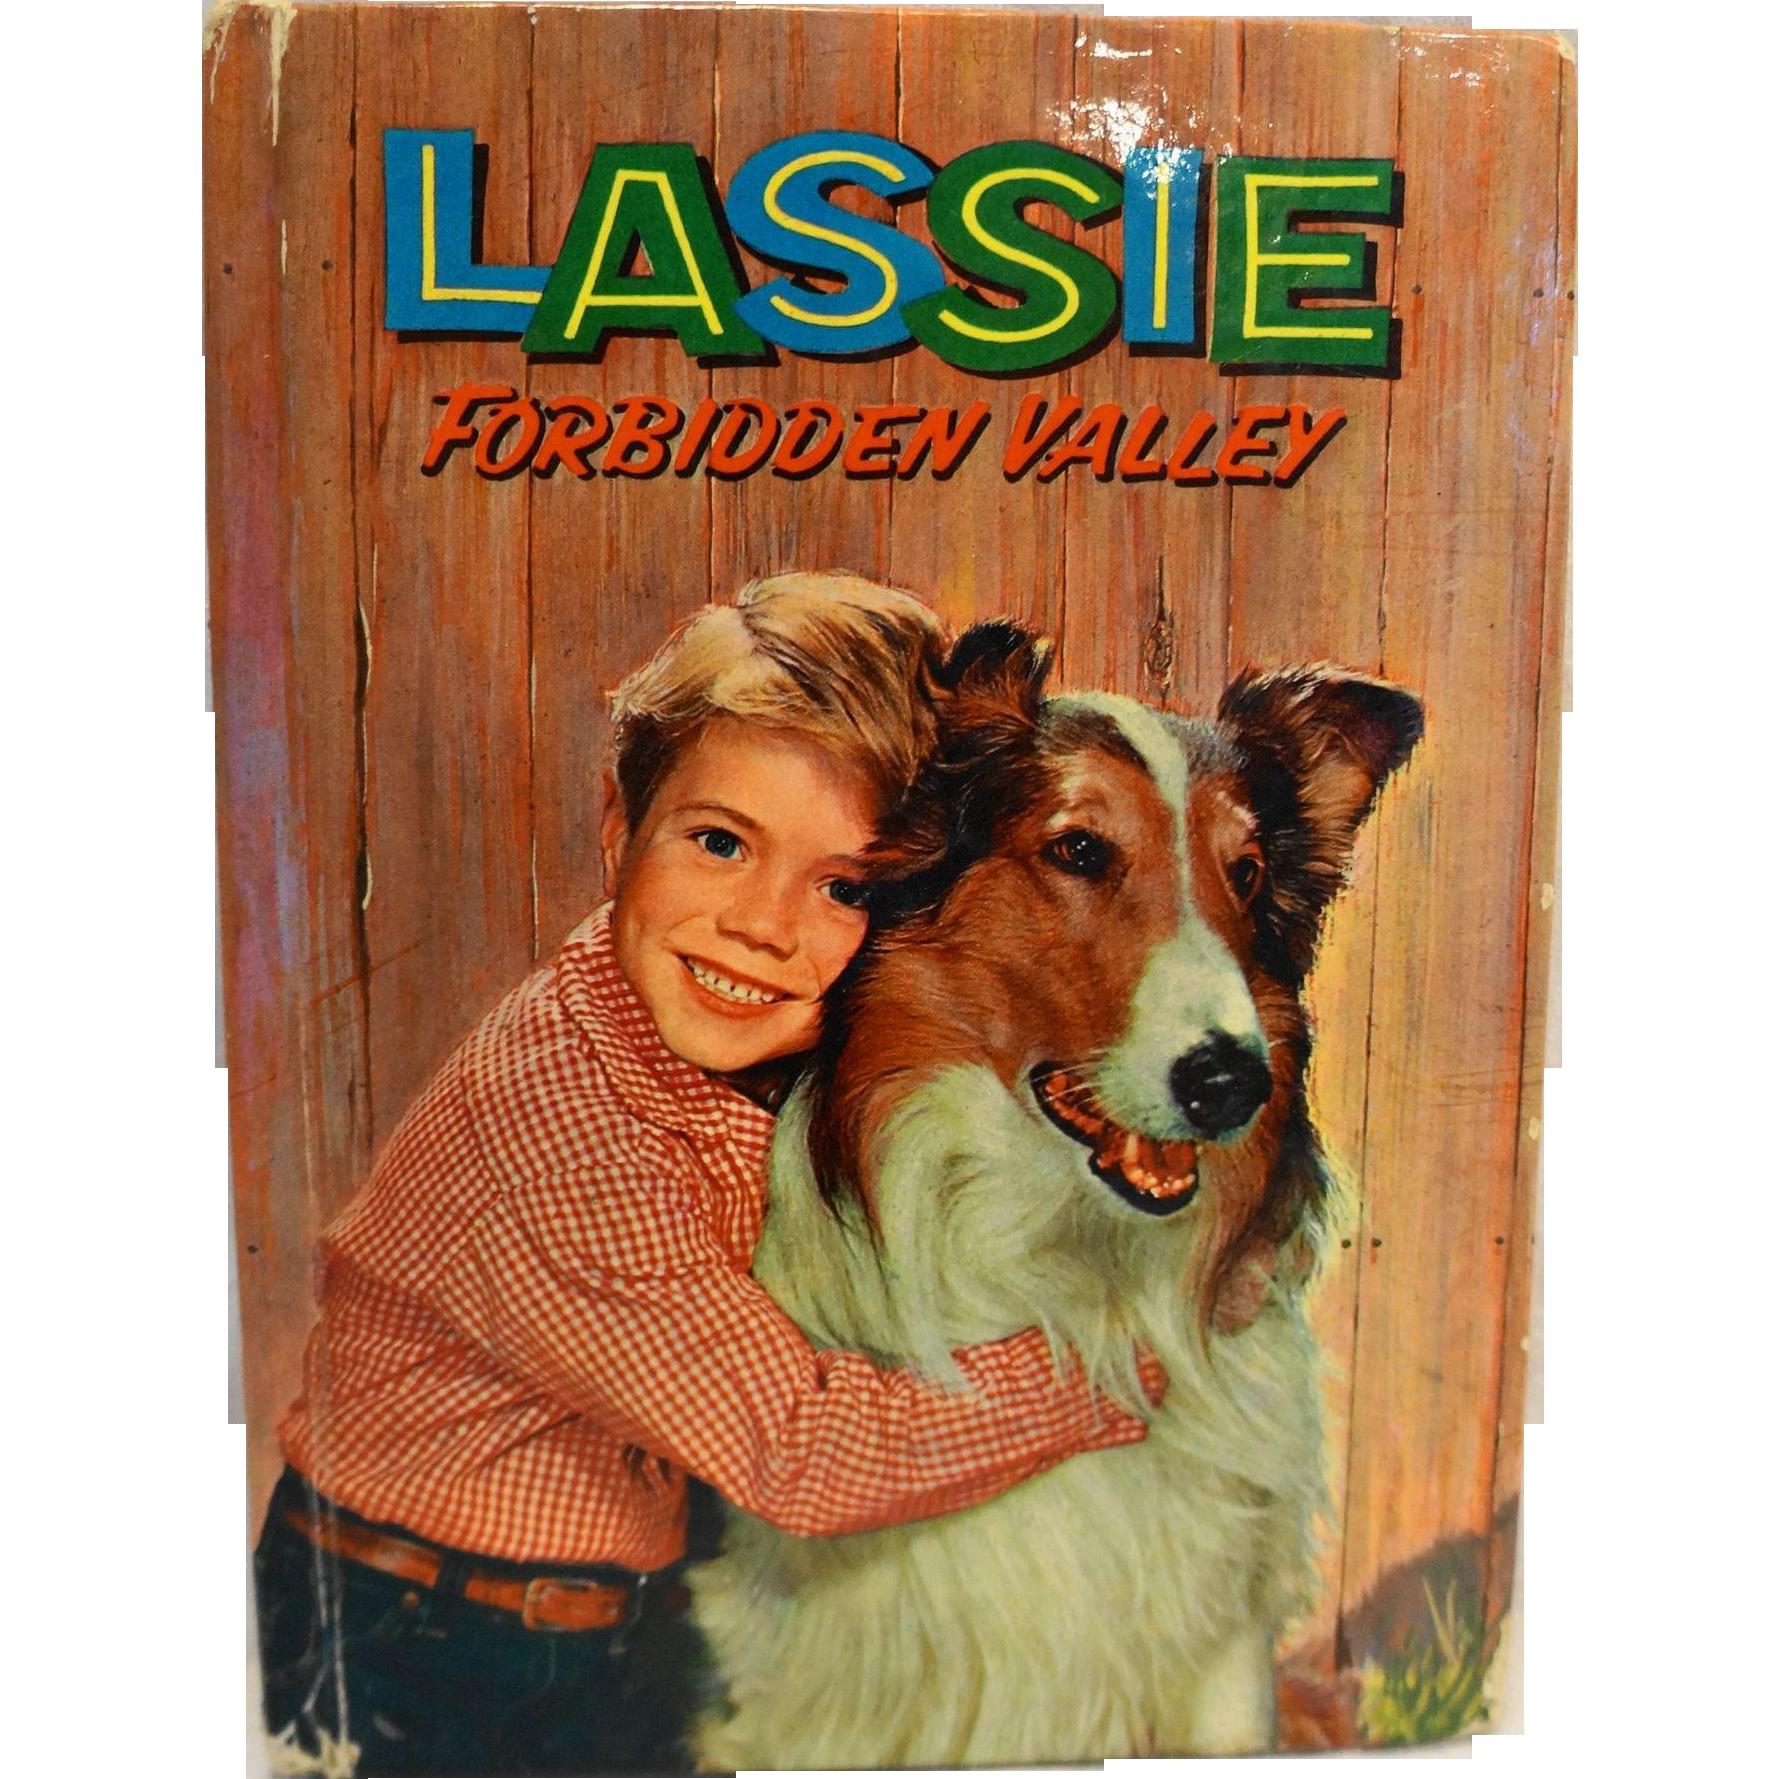 Lassie Forbidden Valley 1959 Hardcover Book Doris Schroeder